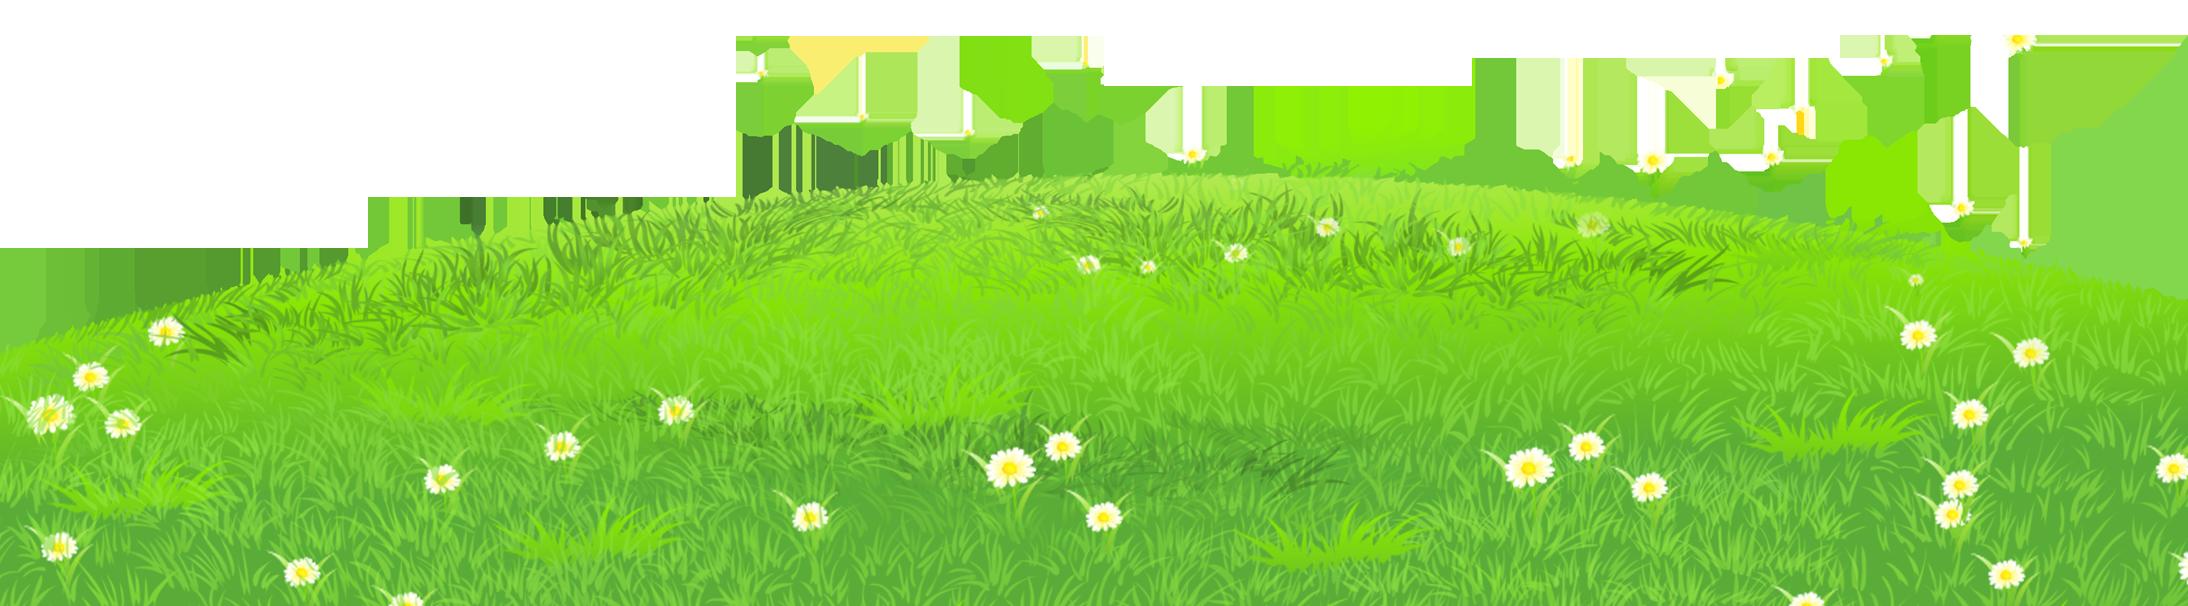 Daisy clipart landscape.